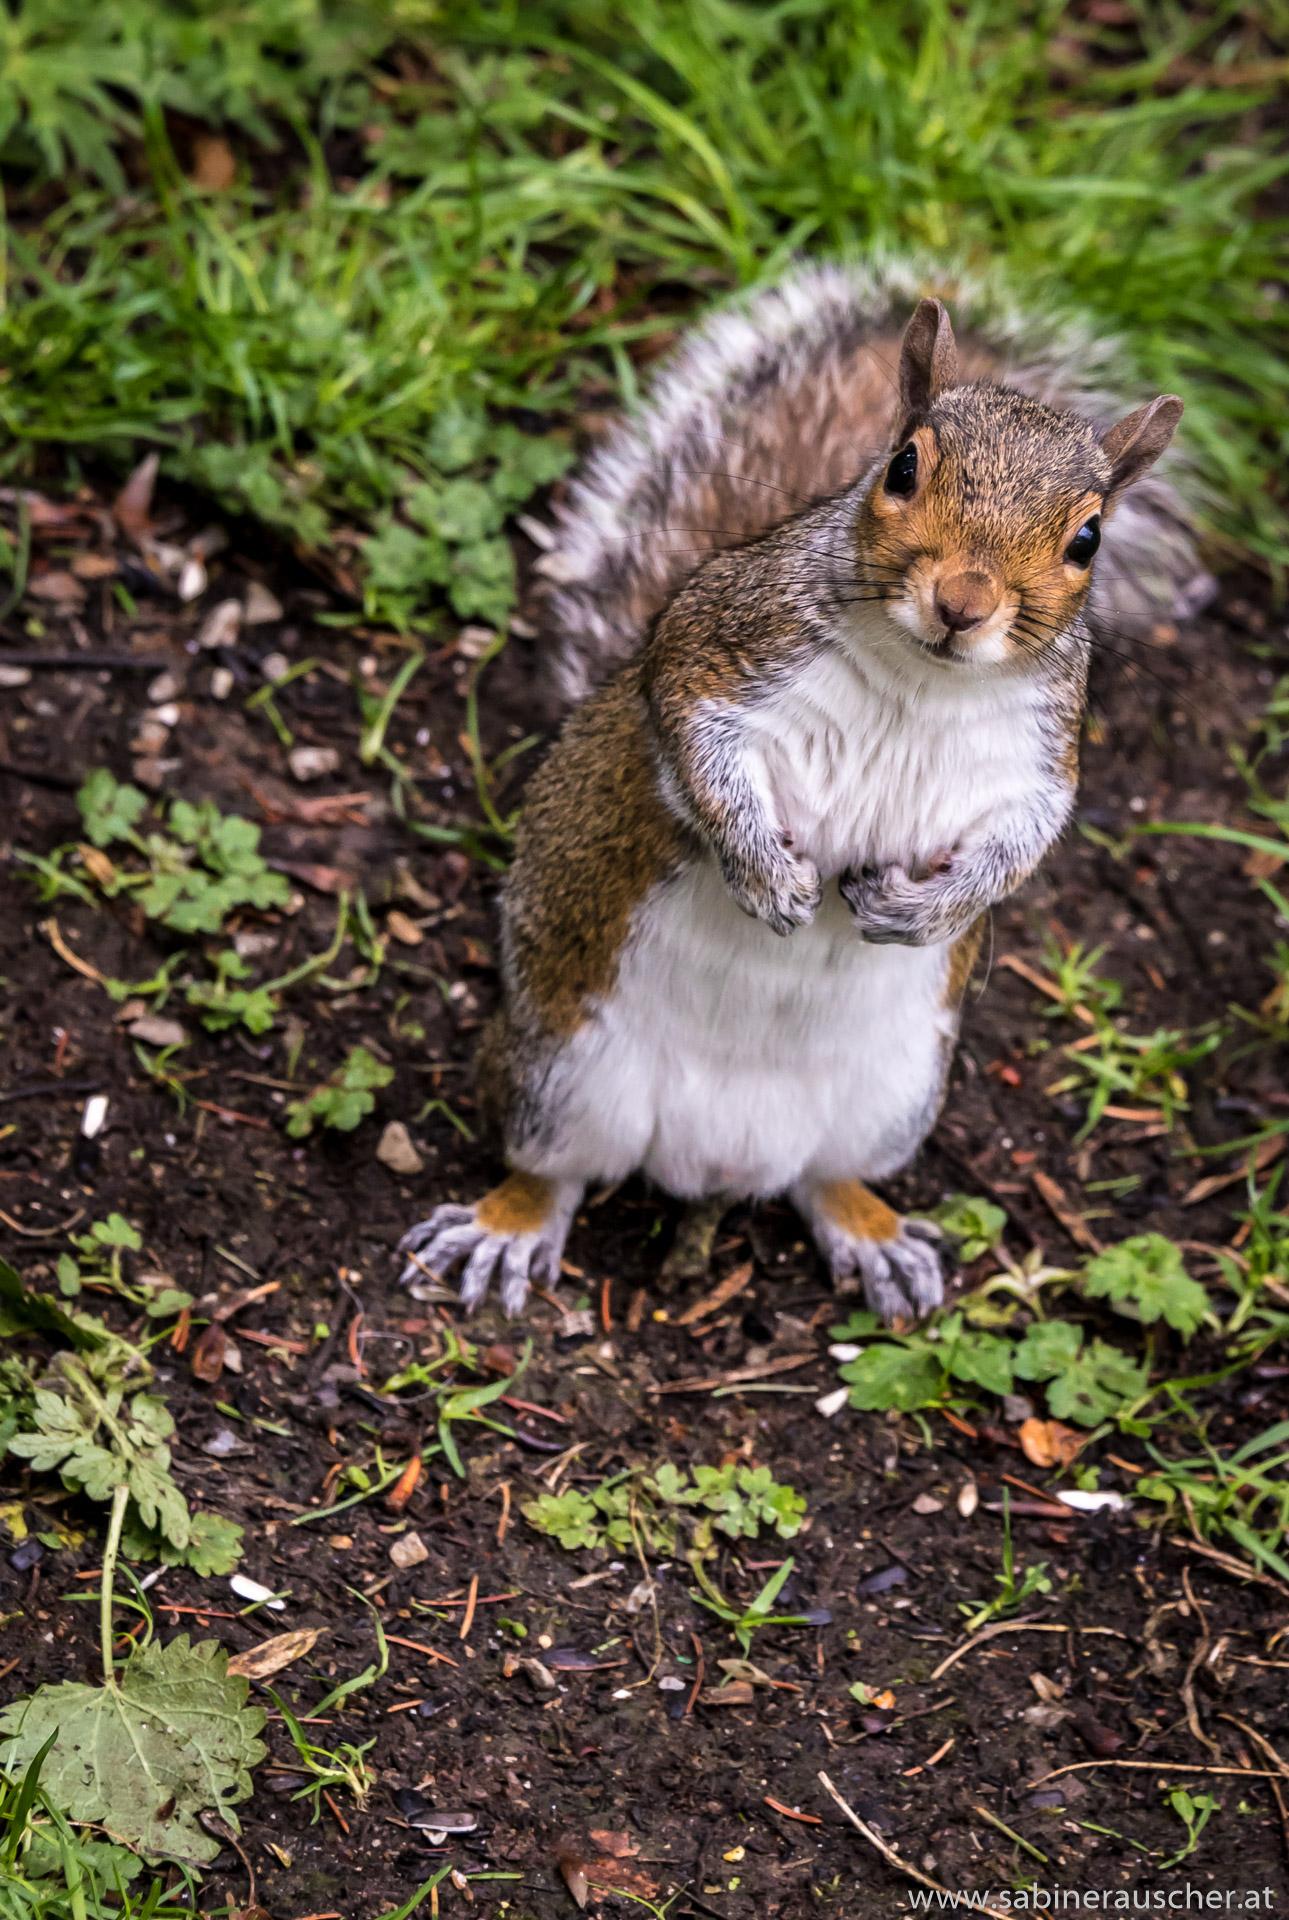 nosy and greedy squirrel at Harlow Carr Gardens in Harrogate   neugieriges Eichhörnchen im RHS Garden Harlow Carr in Wales